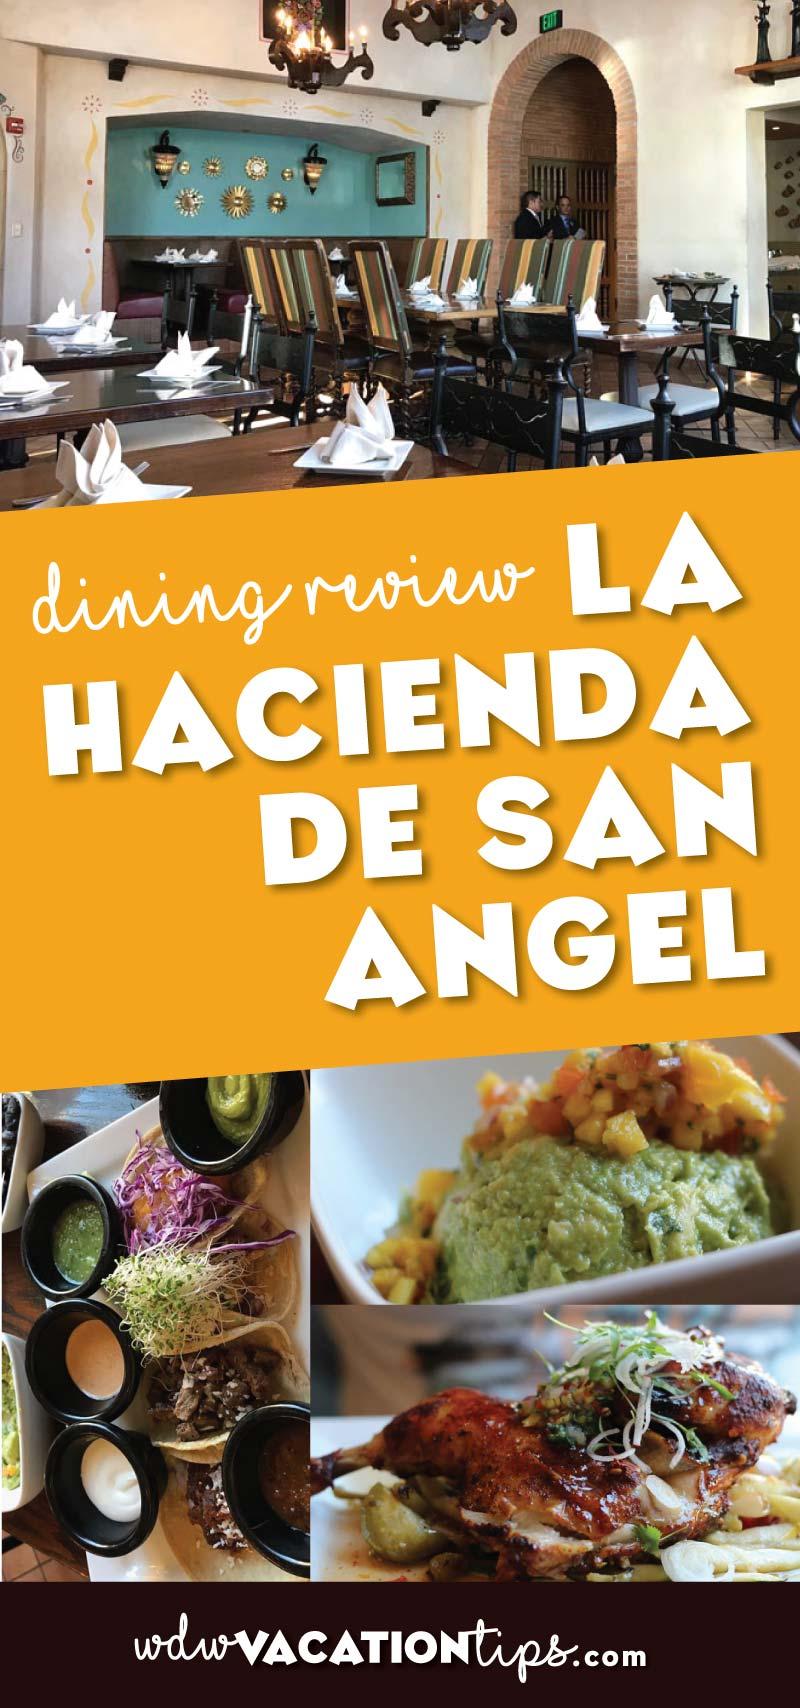 The Mexican restaurant, La Hacienda de San Angel, sits on the water at the Mexico Pavillion inside Epcot, Walt Disney World.